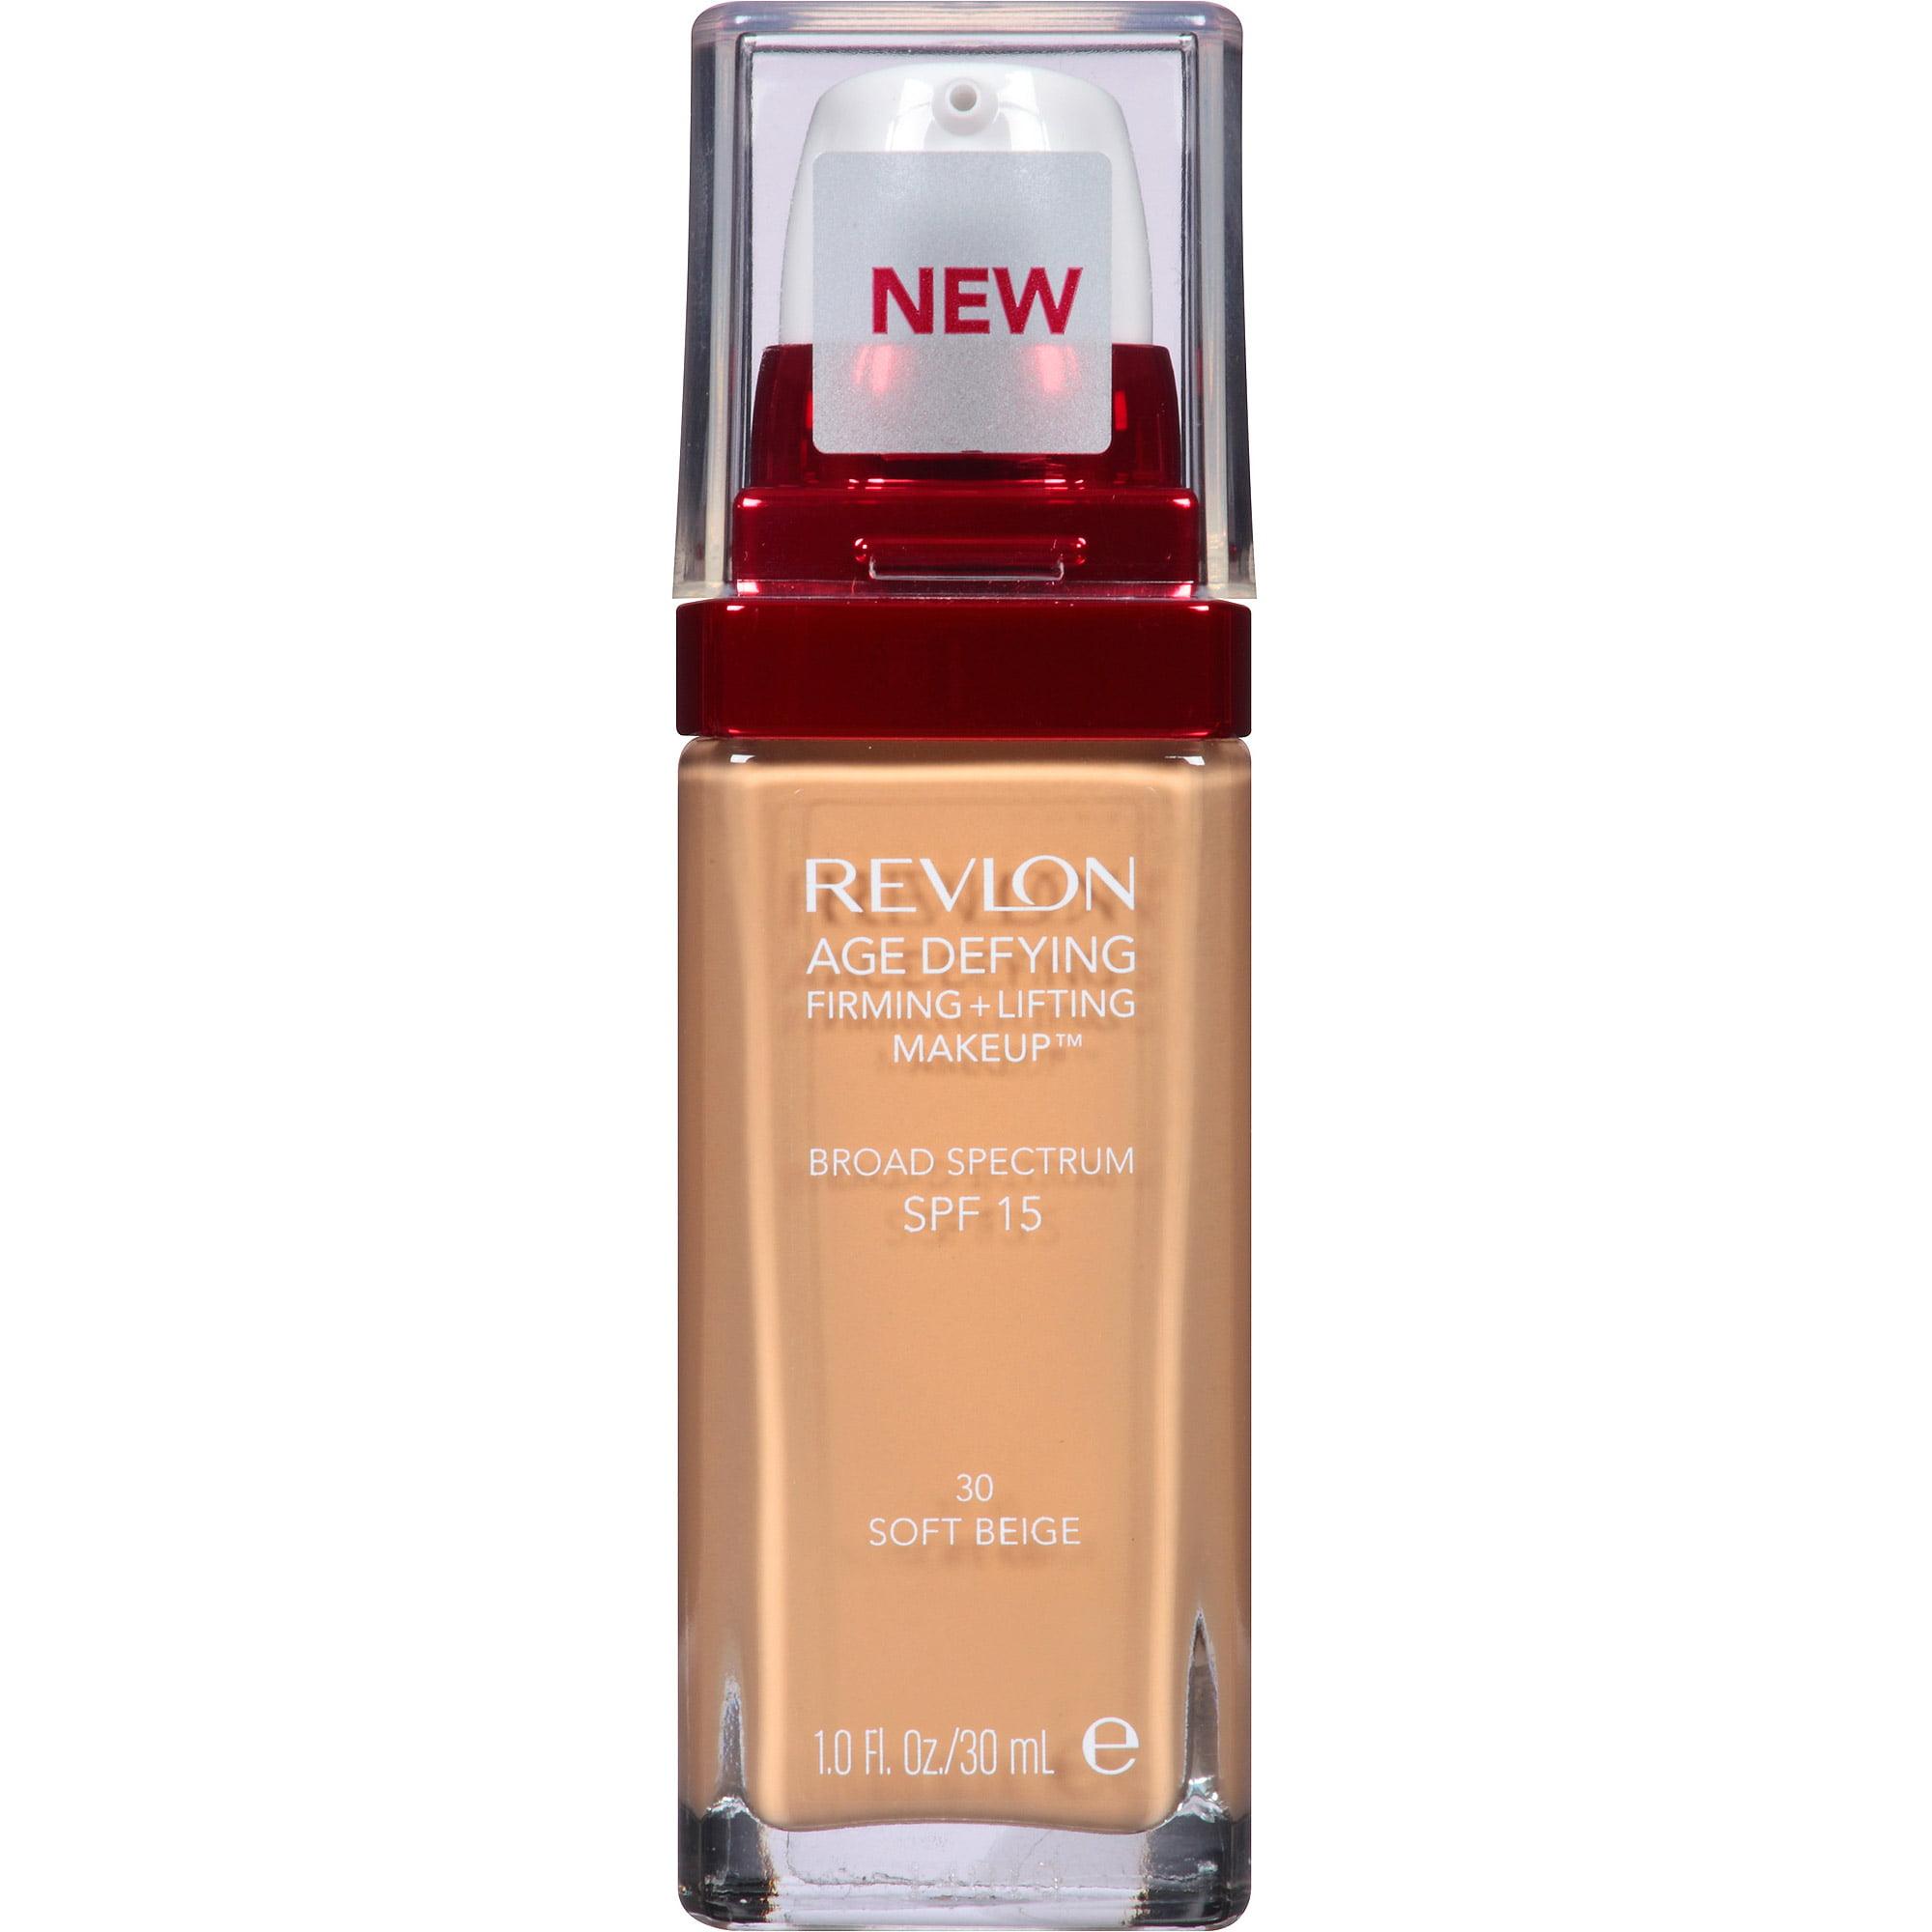 Revlon Age Defying Firming + Lifting Makeup, 30 Soft Beige, 1 fl oz